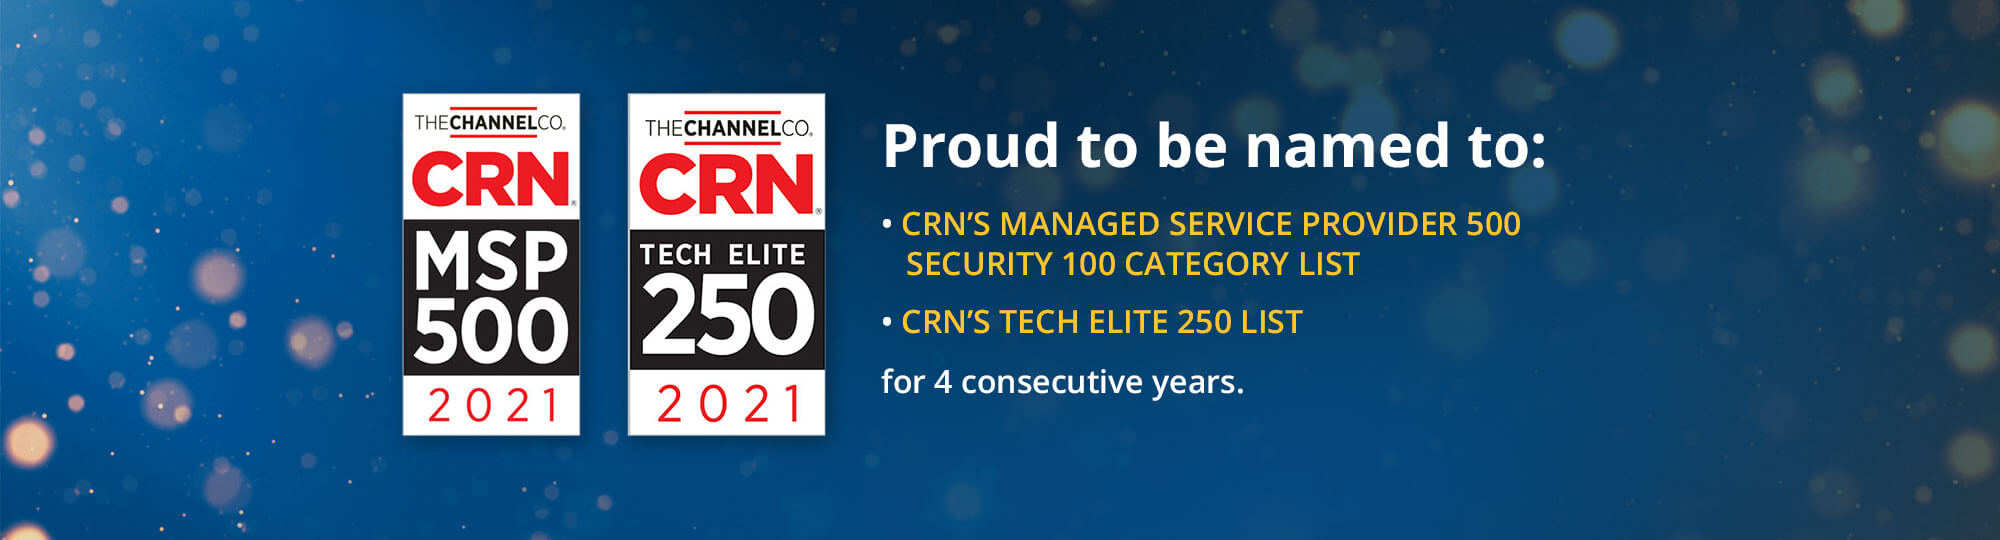 2021 CRN Awards: MSP 500 and Tech Elite 250 Winner